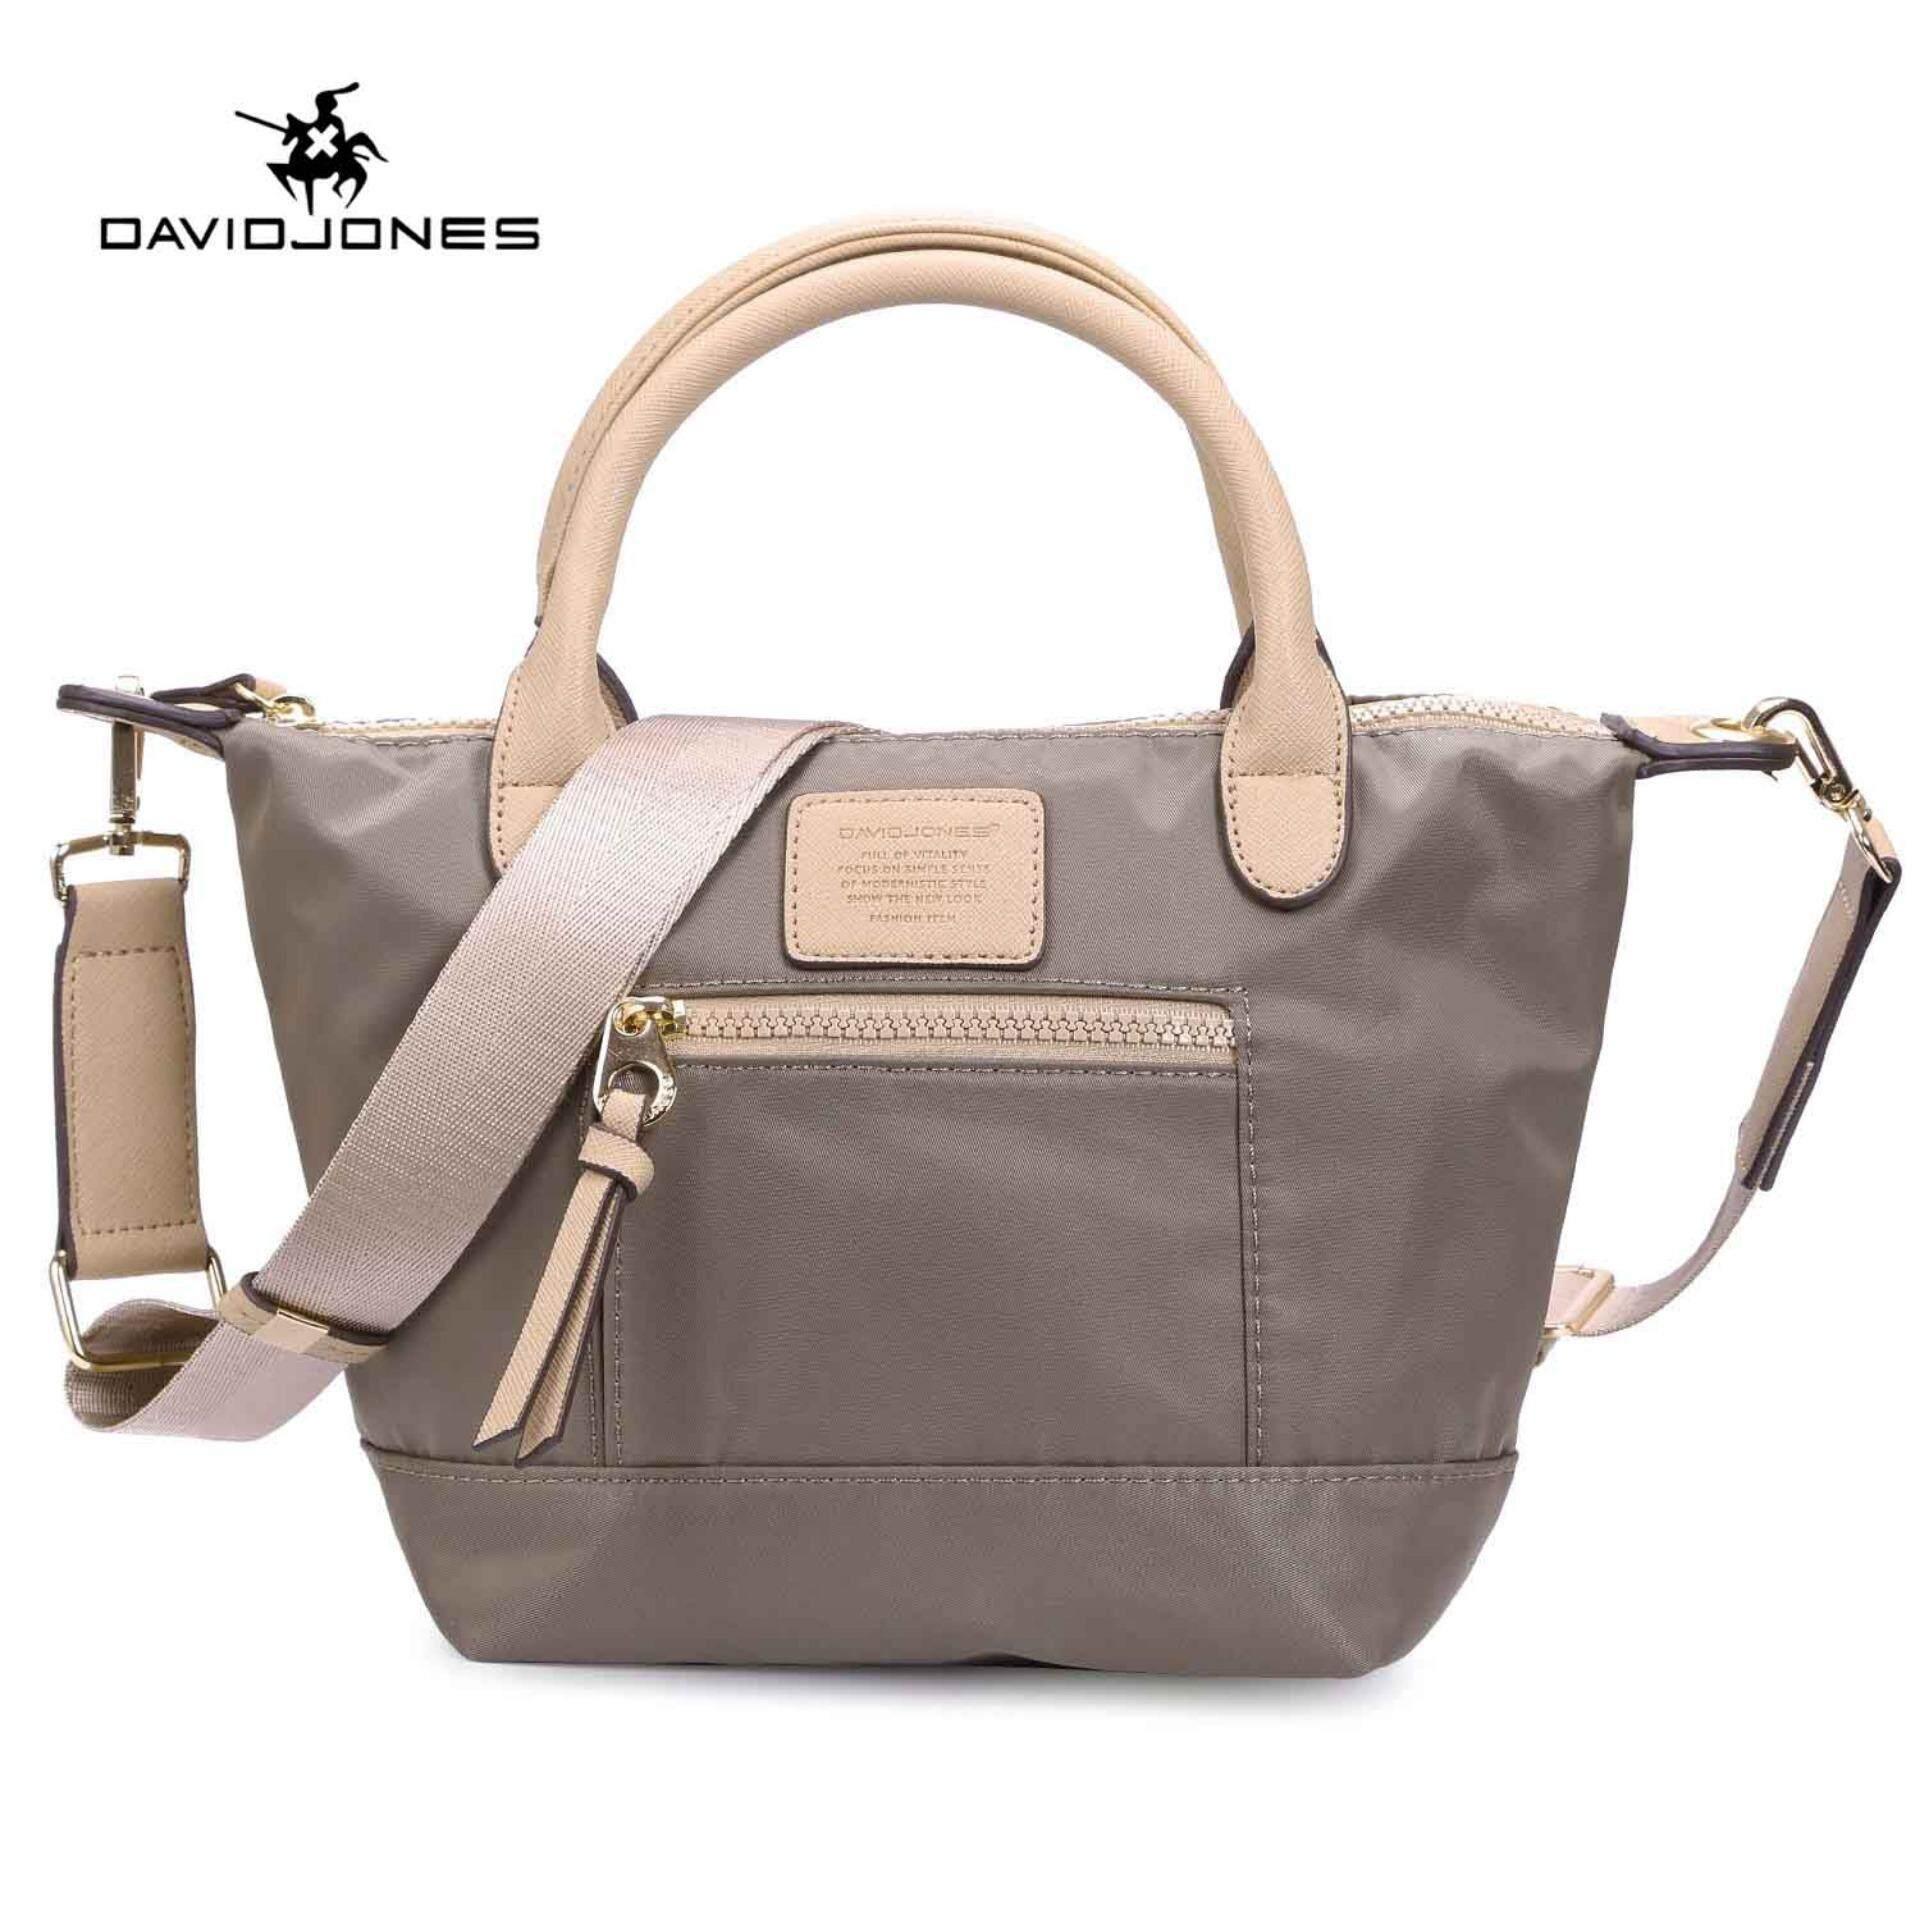 Davidjones Women Nylon Tote Bag Femal Shoulderbag Intl Shopping